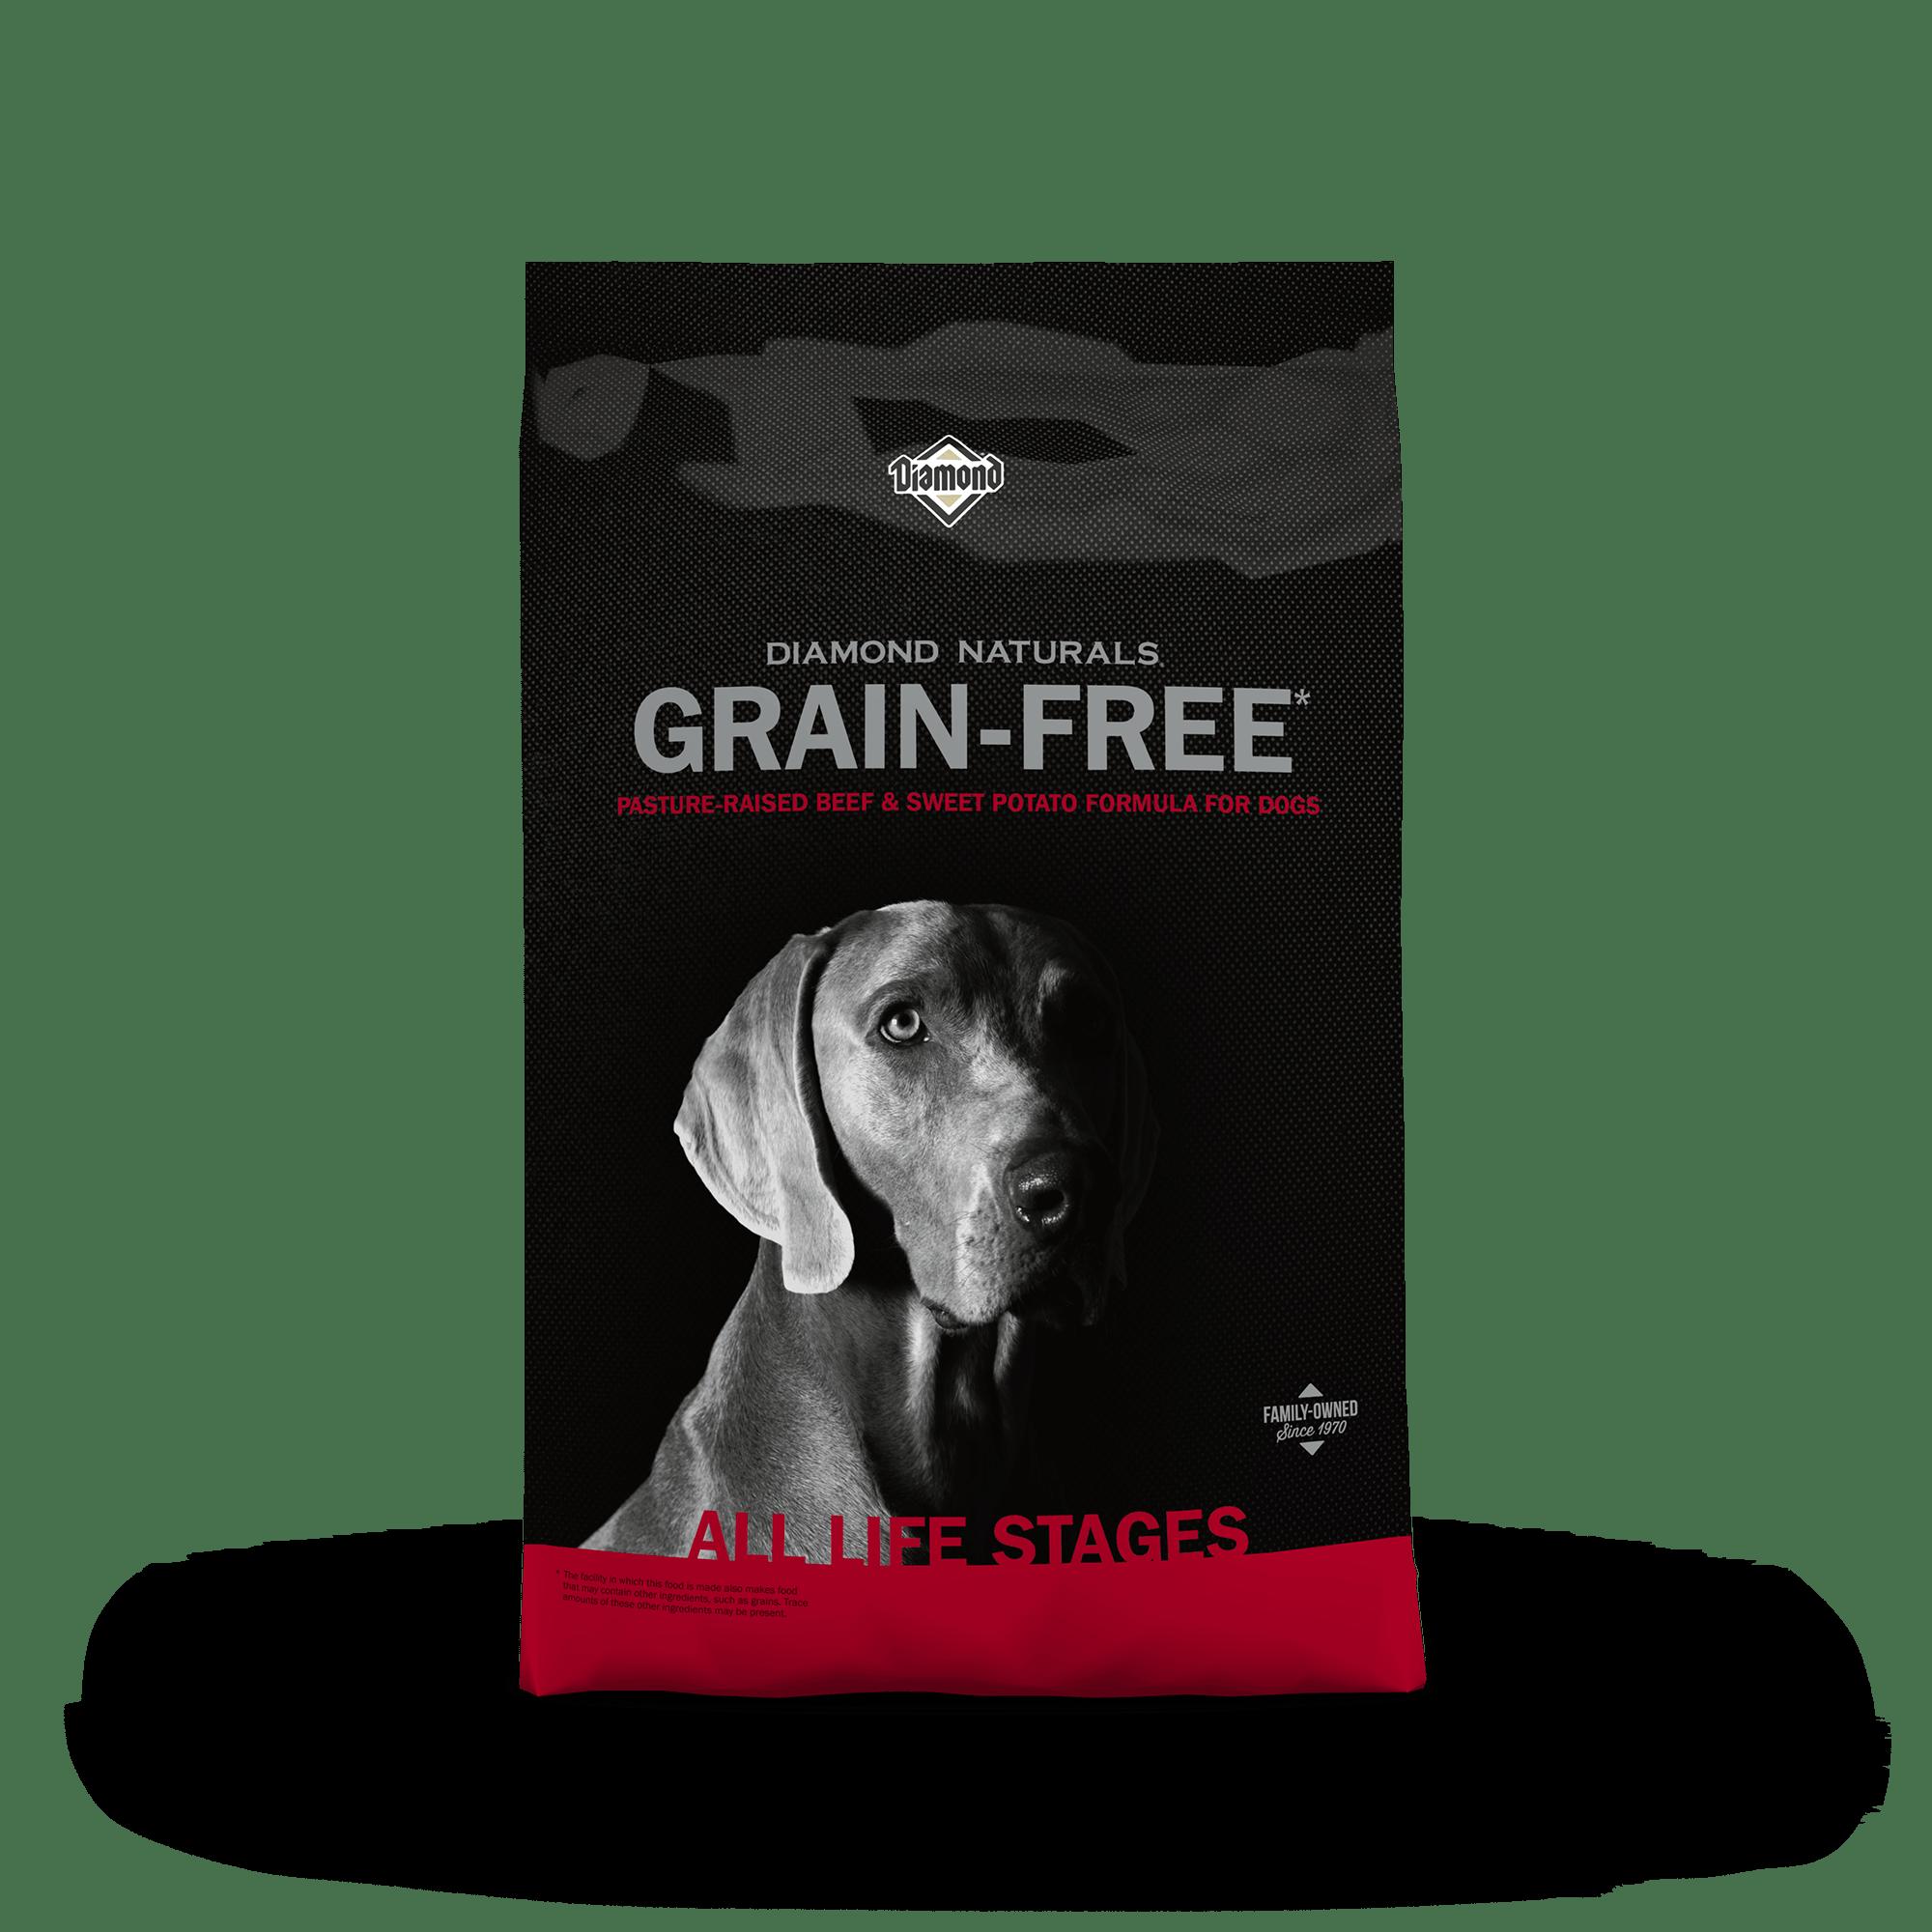 Diamond Naturals Grain-Free Pasture-Raised Beef & Sweet Potato bag